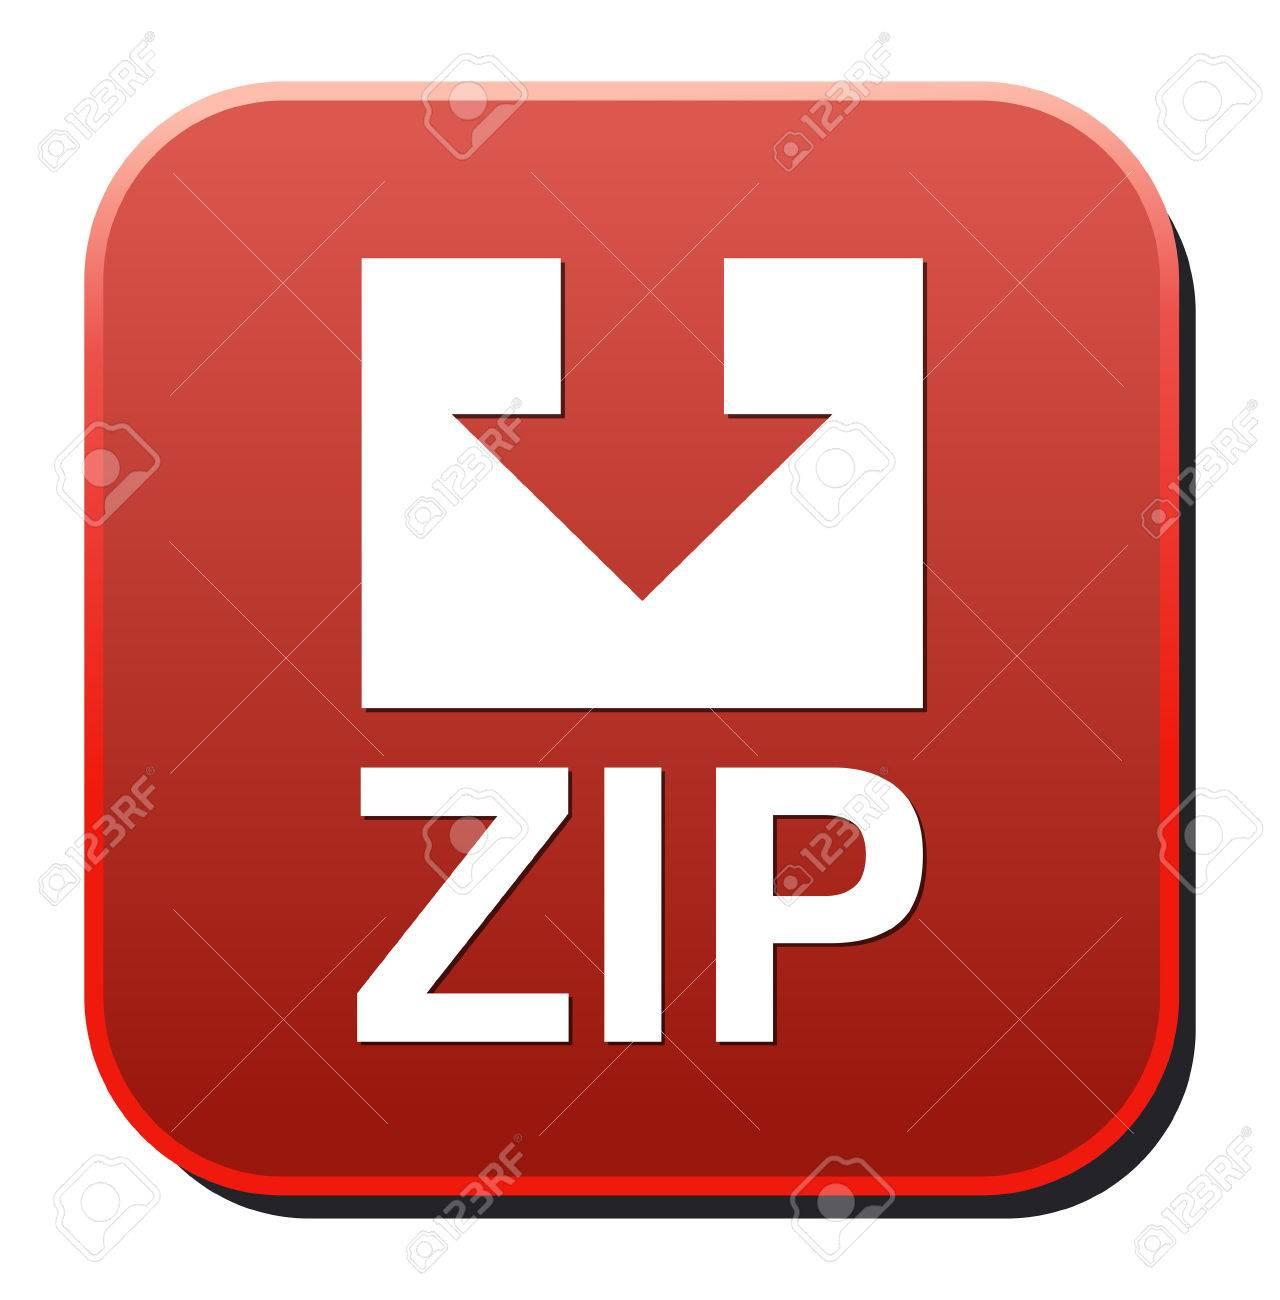 Zip file icon Stock Vector - 26991920